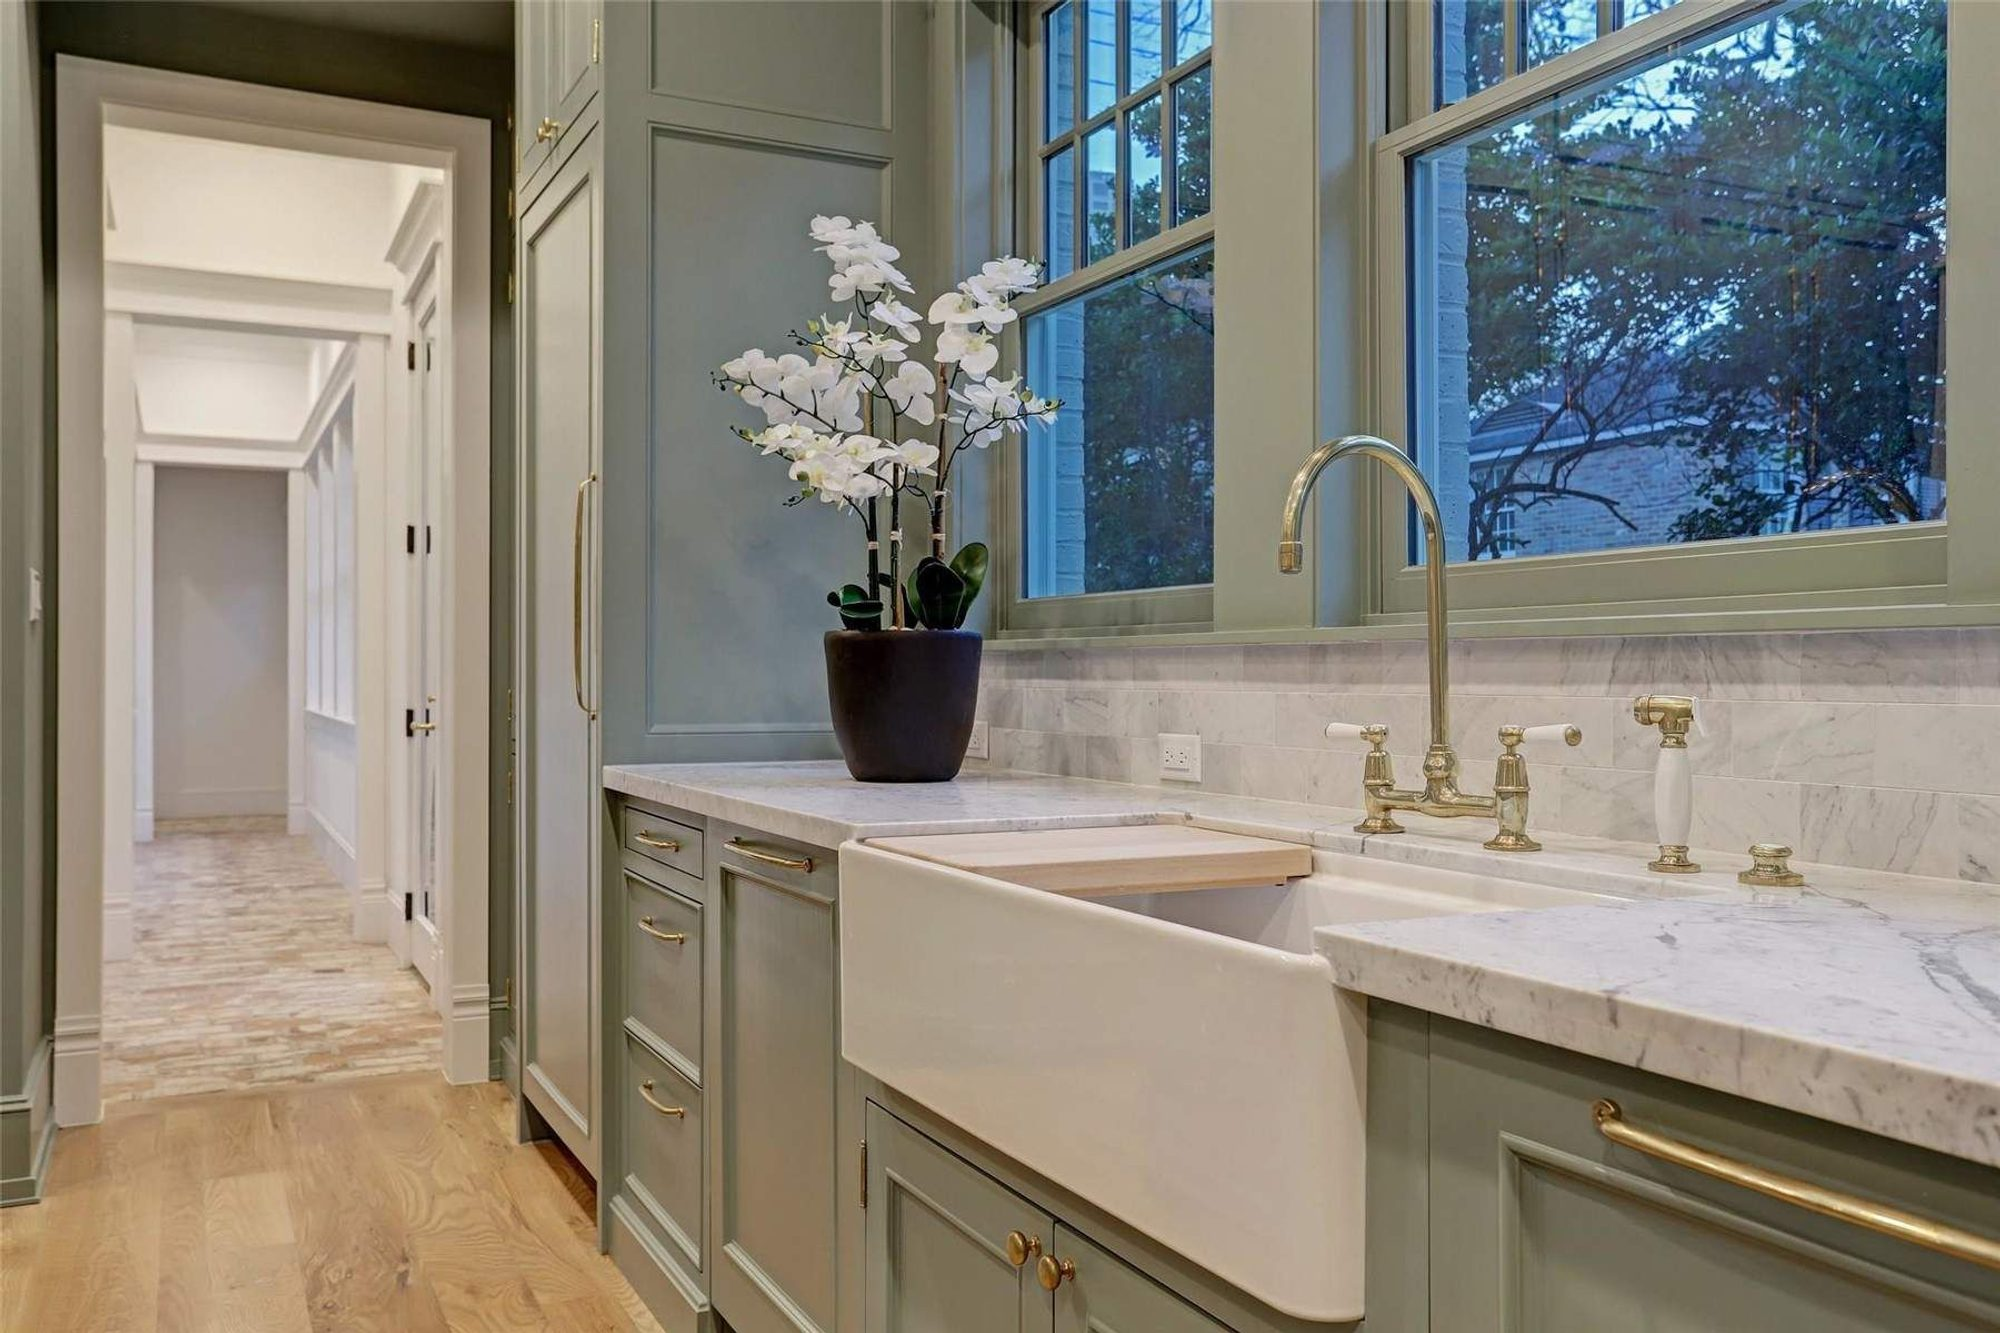 Large farmhouse style single basin white enamel kitchen sink with exposed apron.